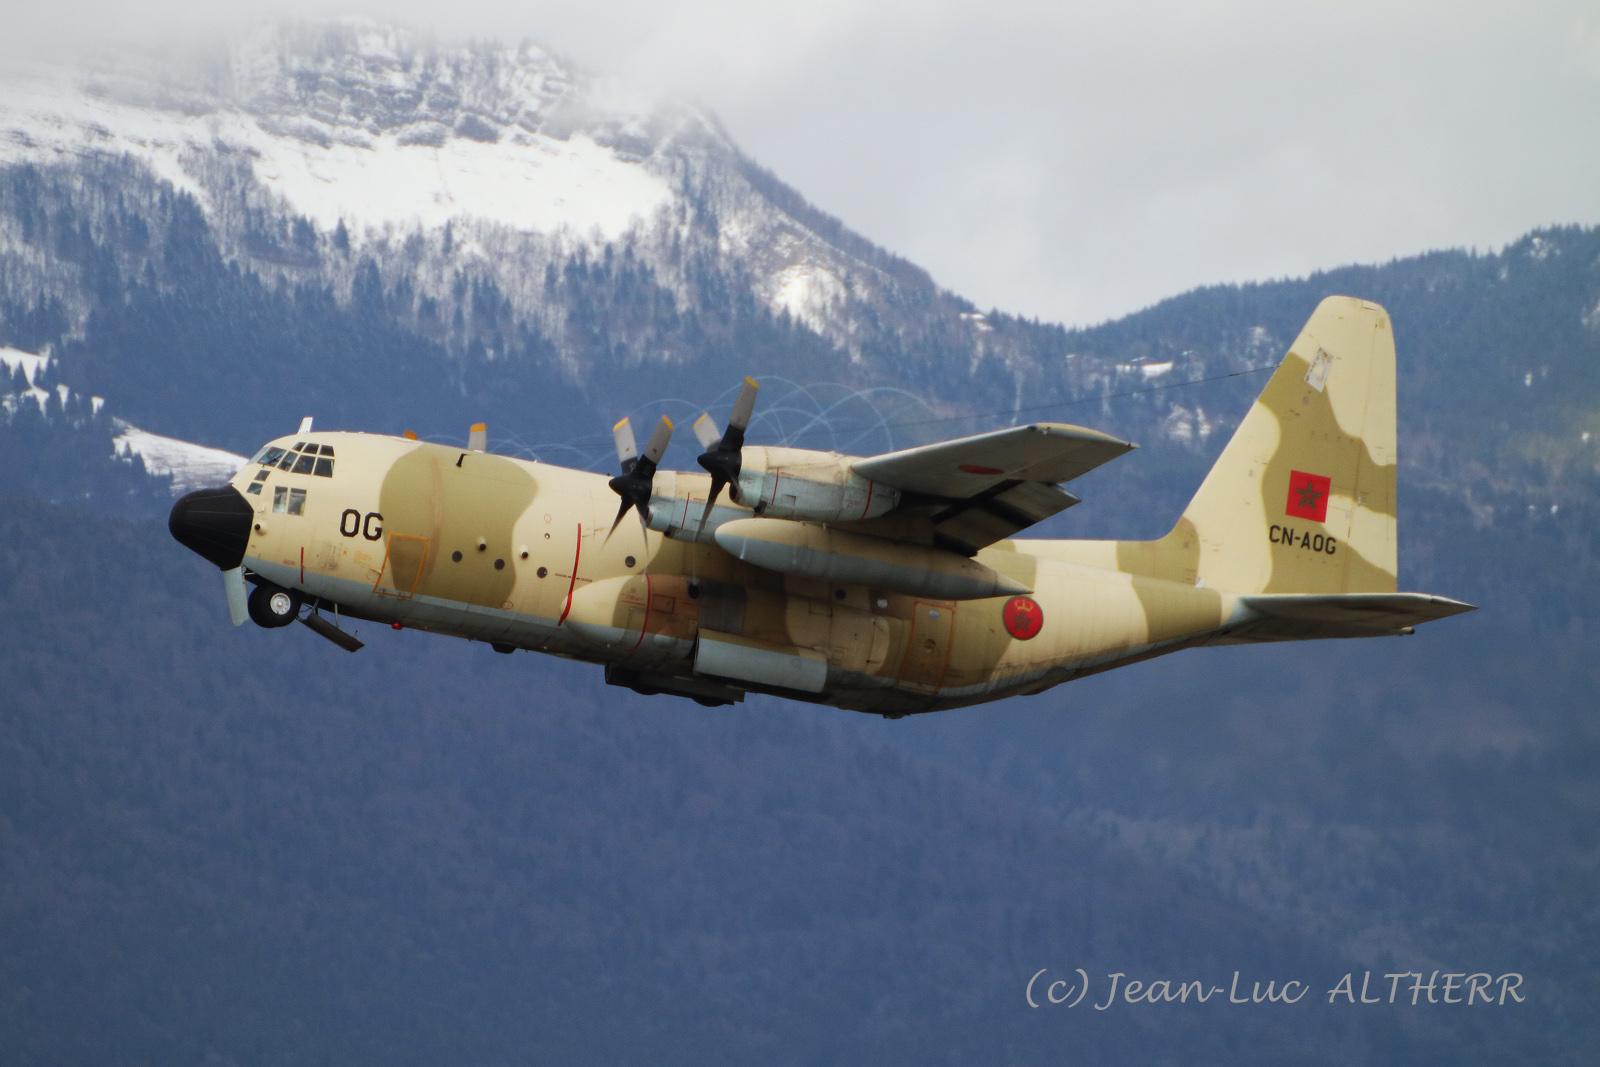 FRA: Photos d'avions de transport - Page 37 33441757978_8a349afd05_o